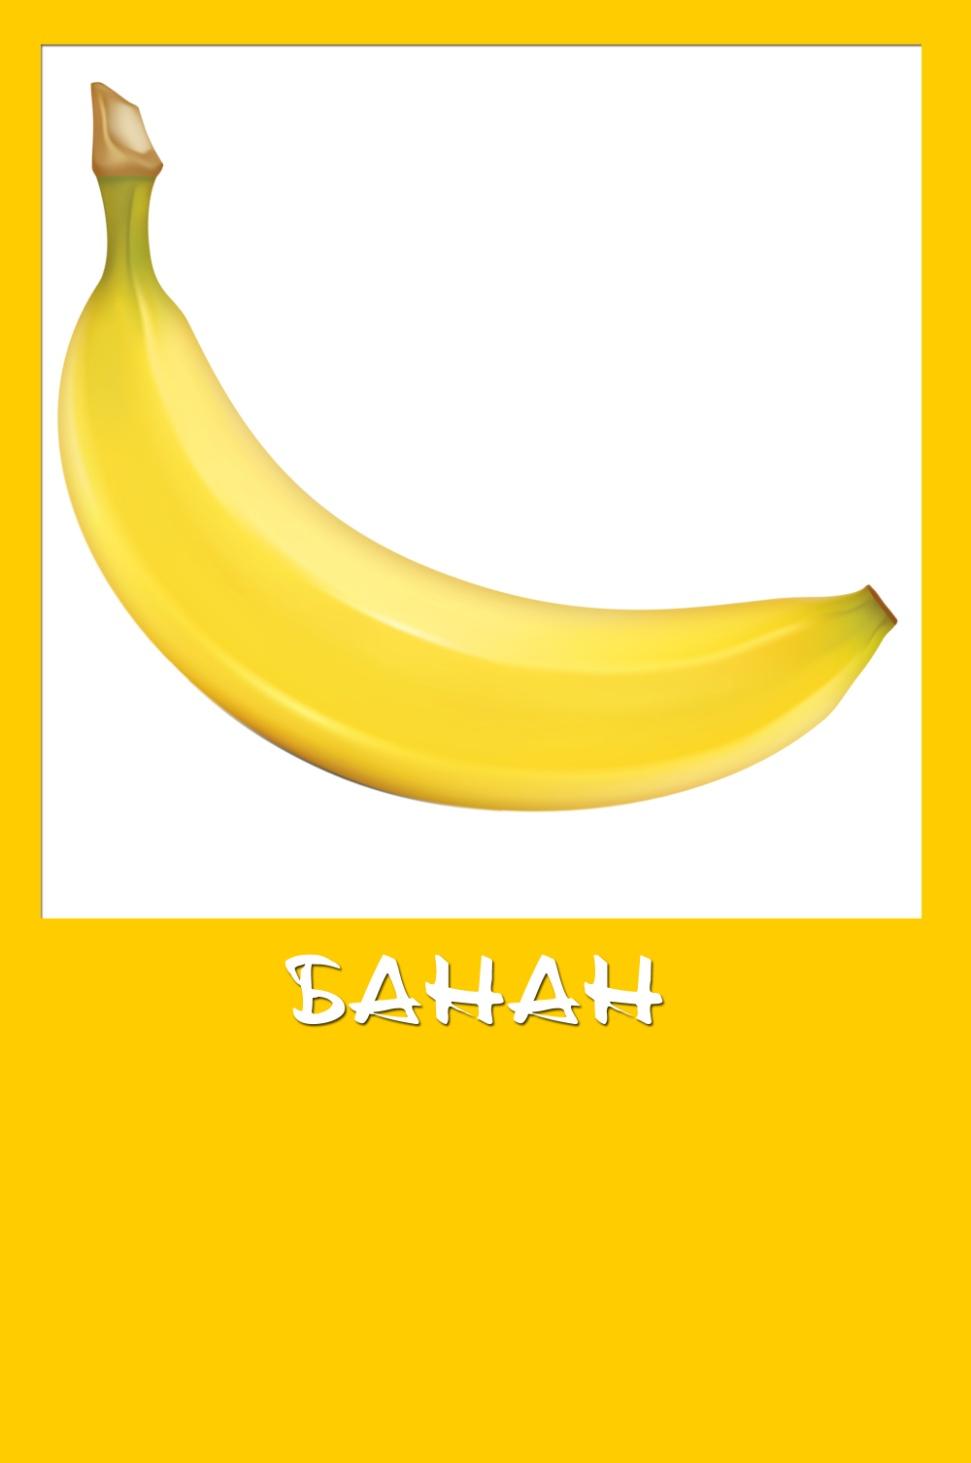 I:\8.03-мероприятия\русские красавицы\Кастрюли\фрукты\банан.jpg